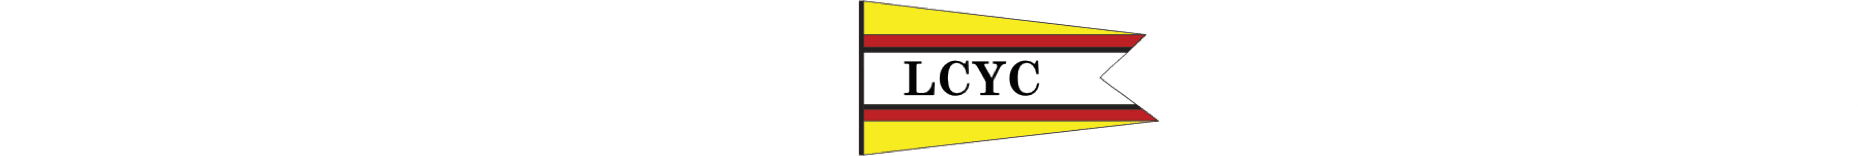 Lake Canyon Yacht Club